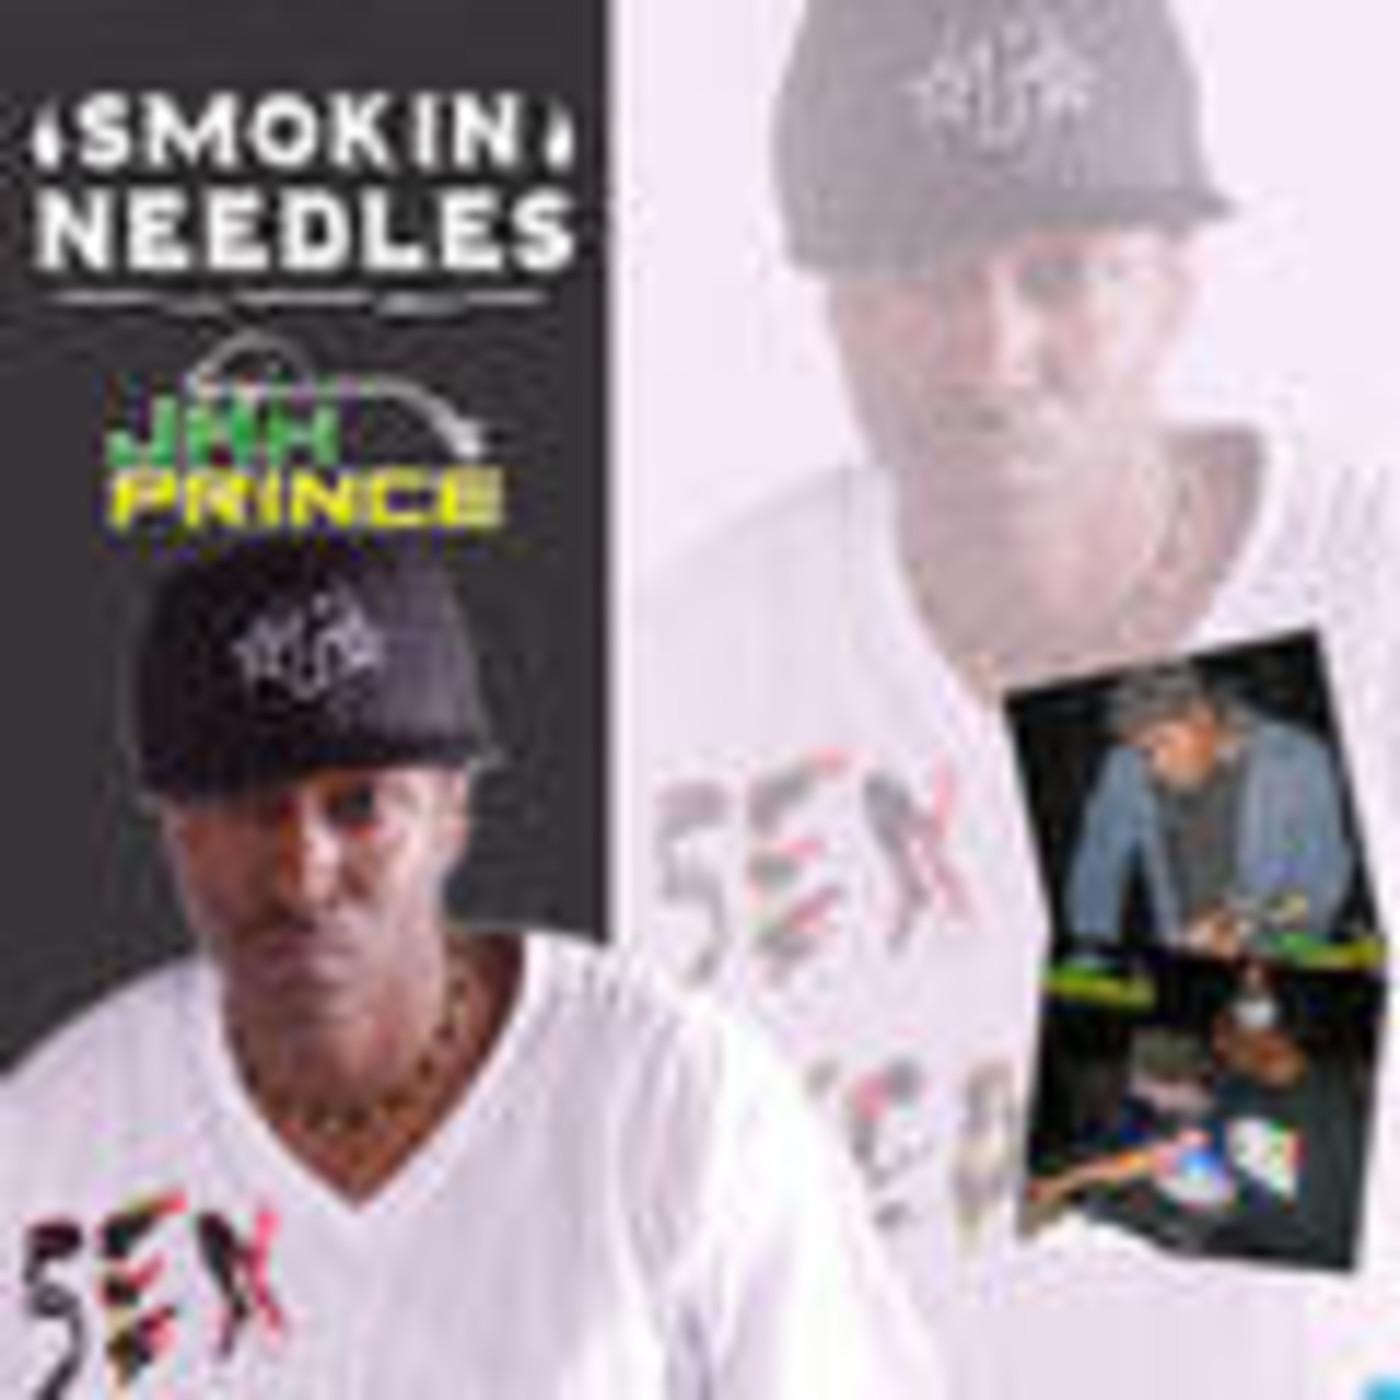 Jah Prince